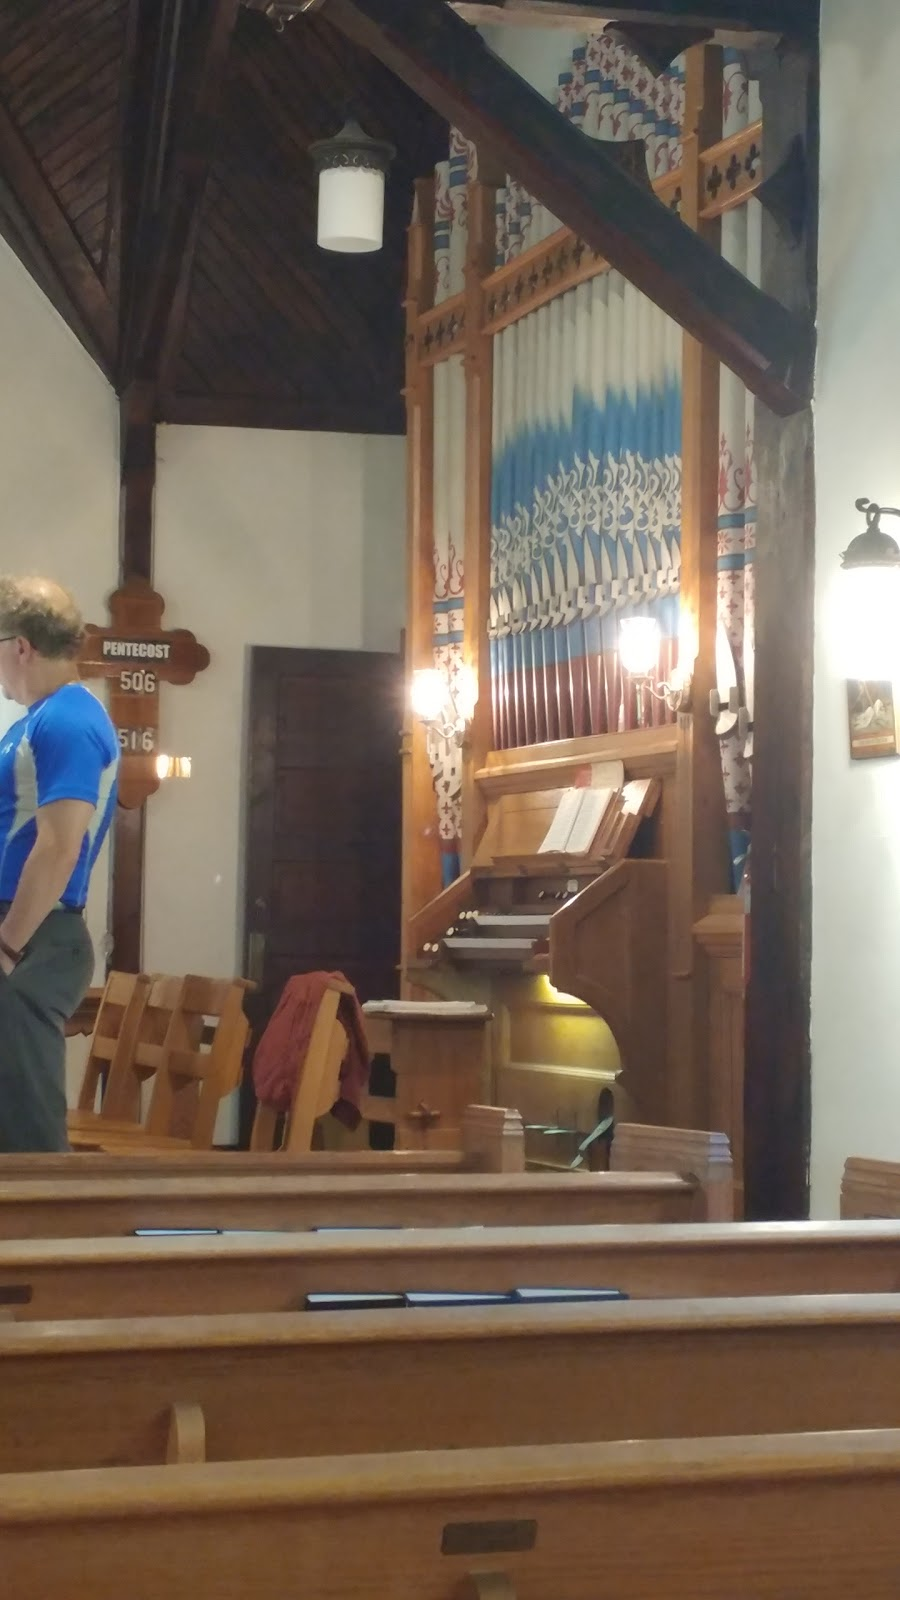 St Johns Episcopal Church - church    Photo 9 of 10   Address: 3857 N Kostner Ave, Chicago, IL 60641, USA   Phone: (773) 725-9026